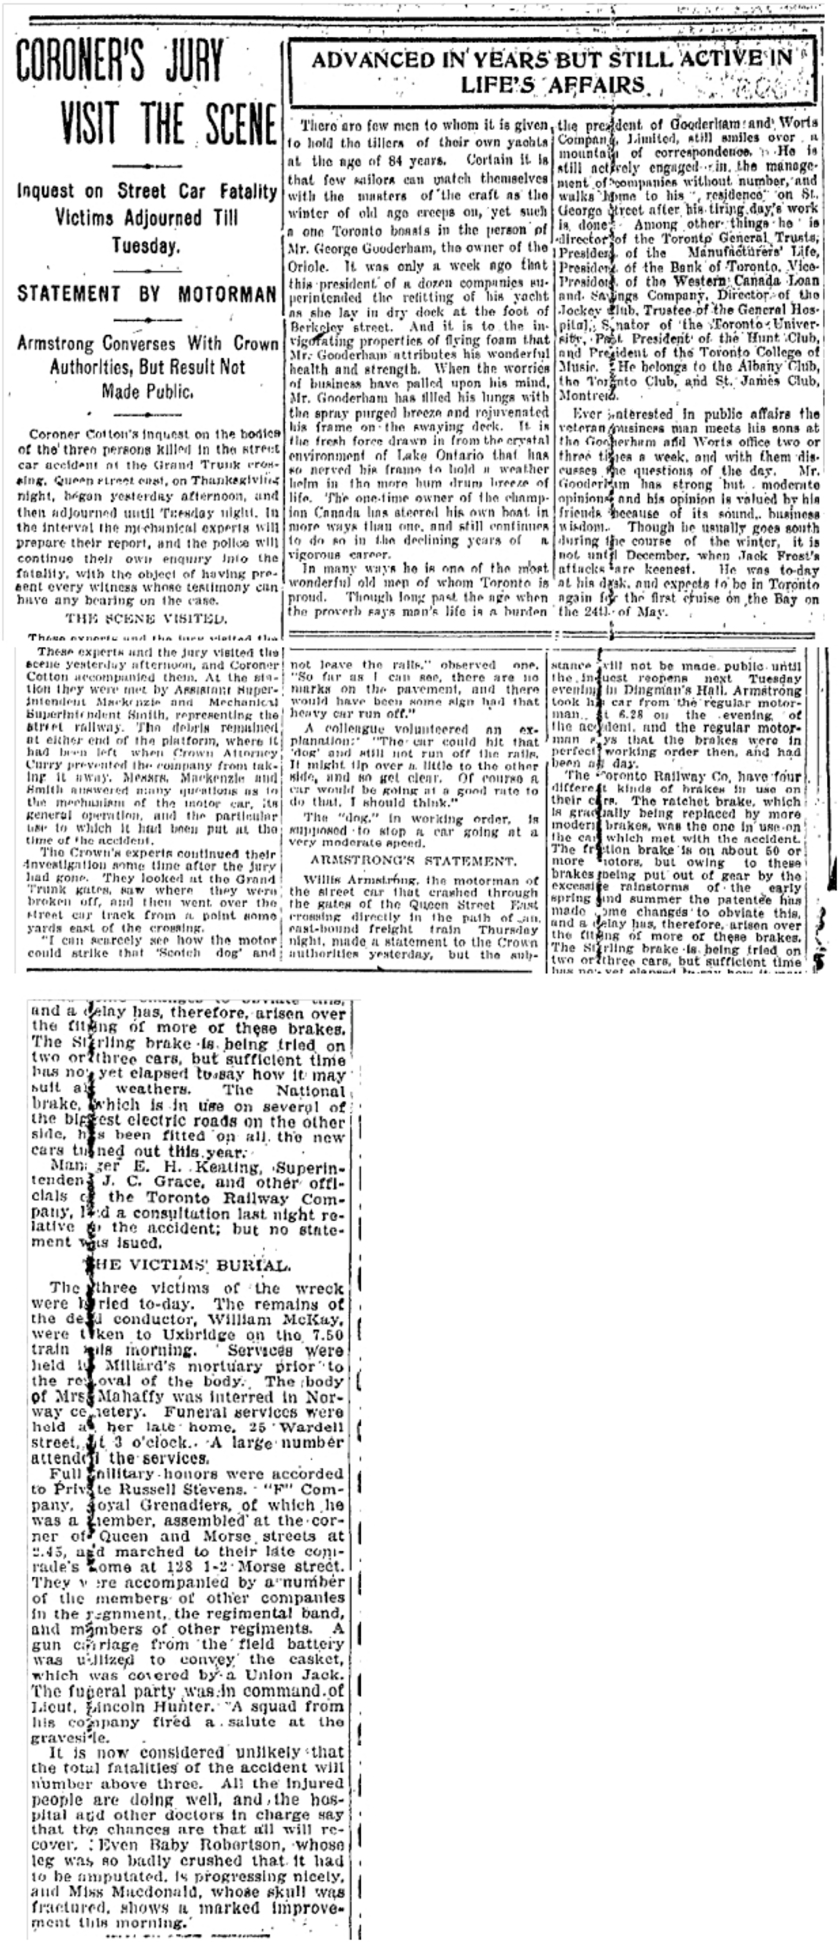 128 Morse Street  Toronto Star, Nov. 1904